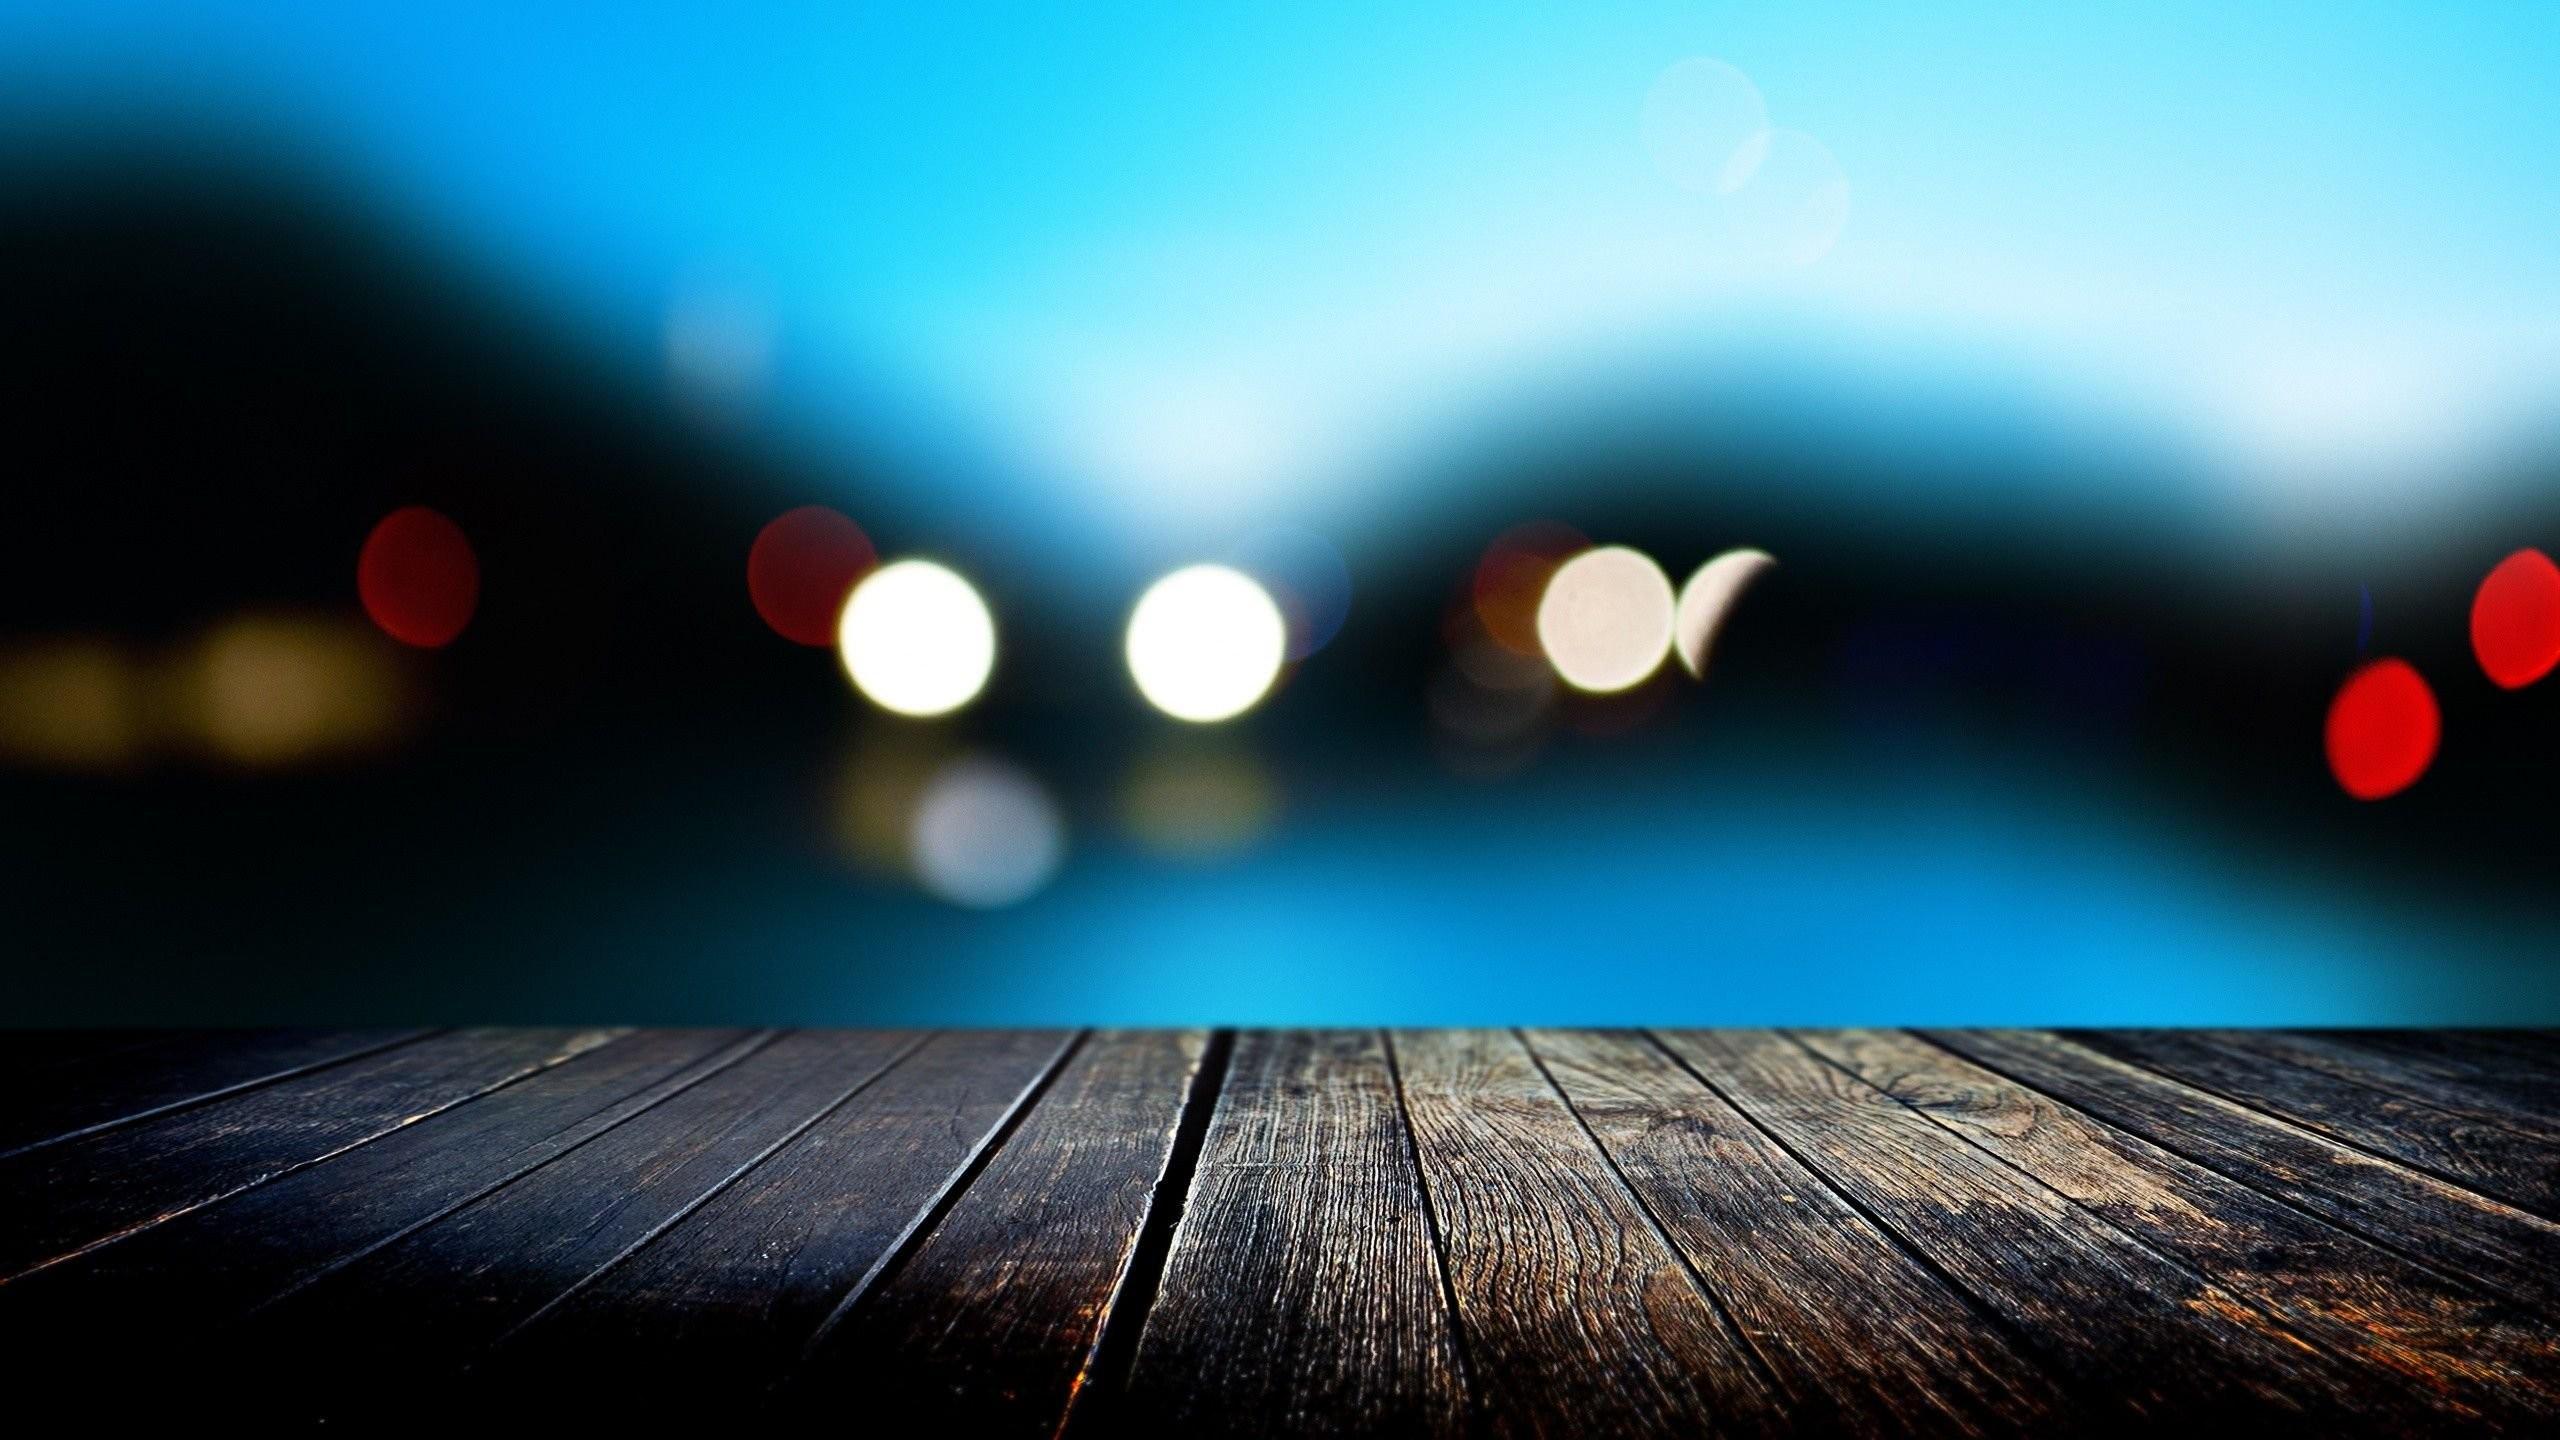 Res: 2560x1440, Bubble Light Wallpaper Beautiful Scenic Wallpapers Water Wallpapers Dock  Wallpapers Lights